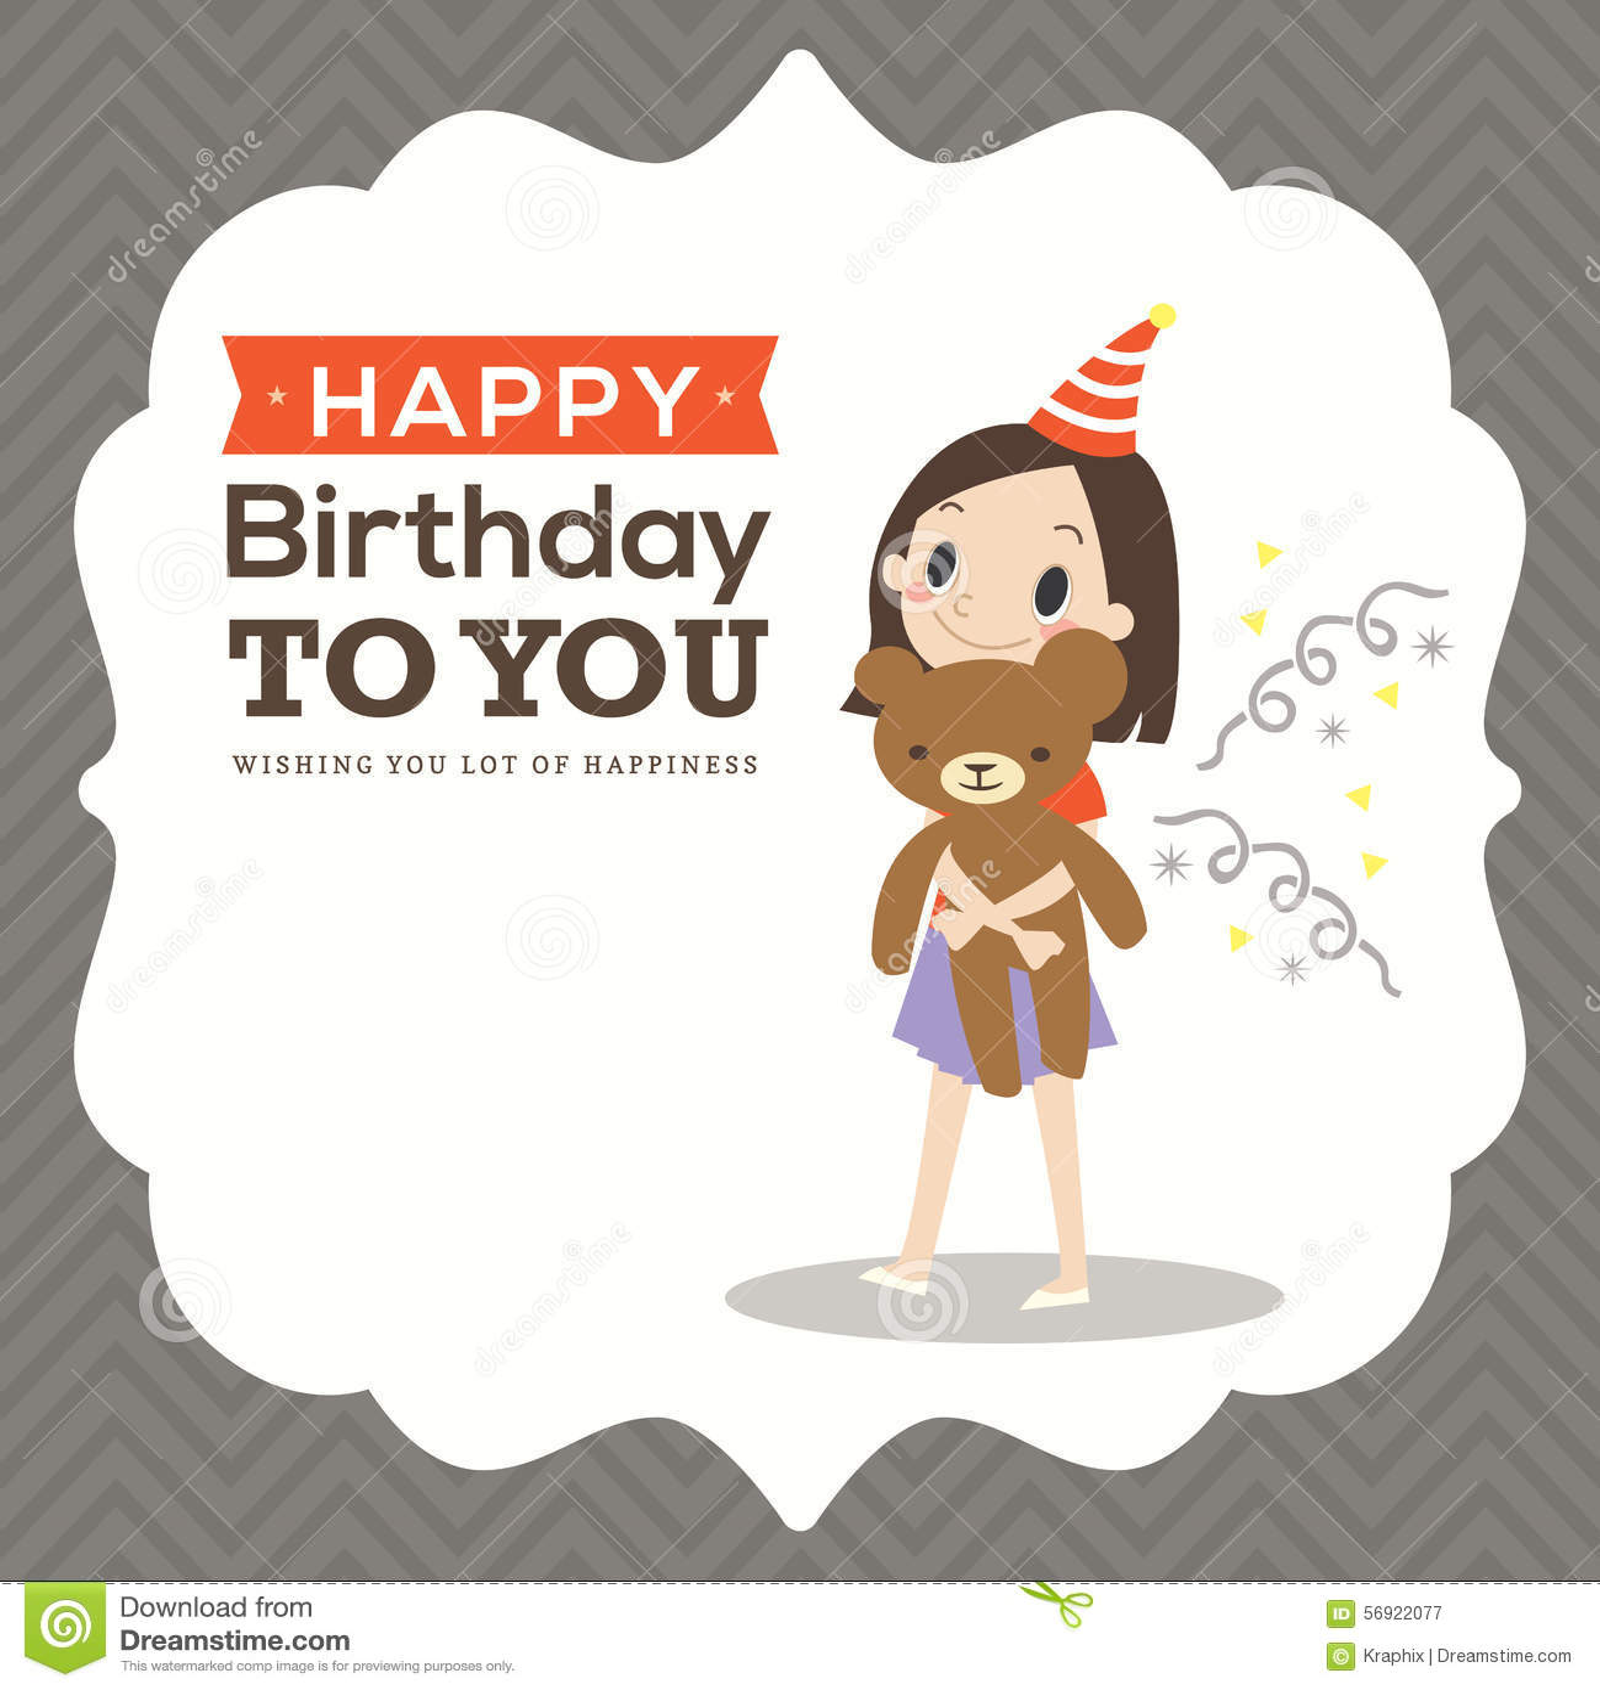 Happy Birthday Card With Kid Cartoon Vector Image 56922077 – Birthday Card for Kid